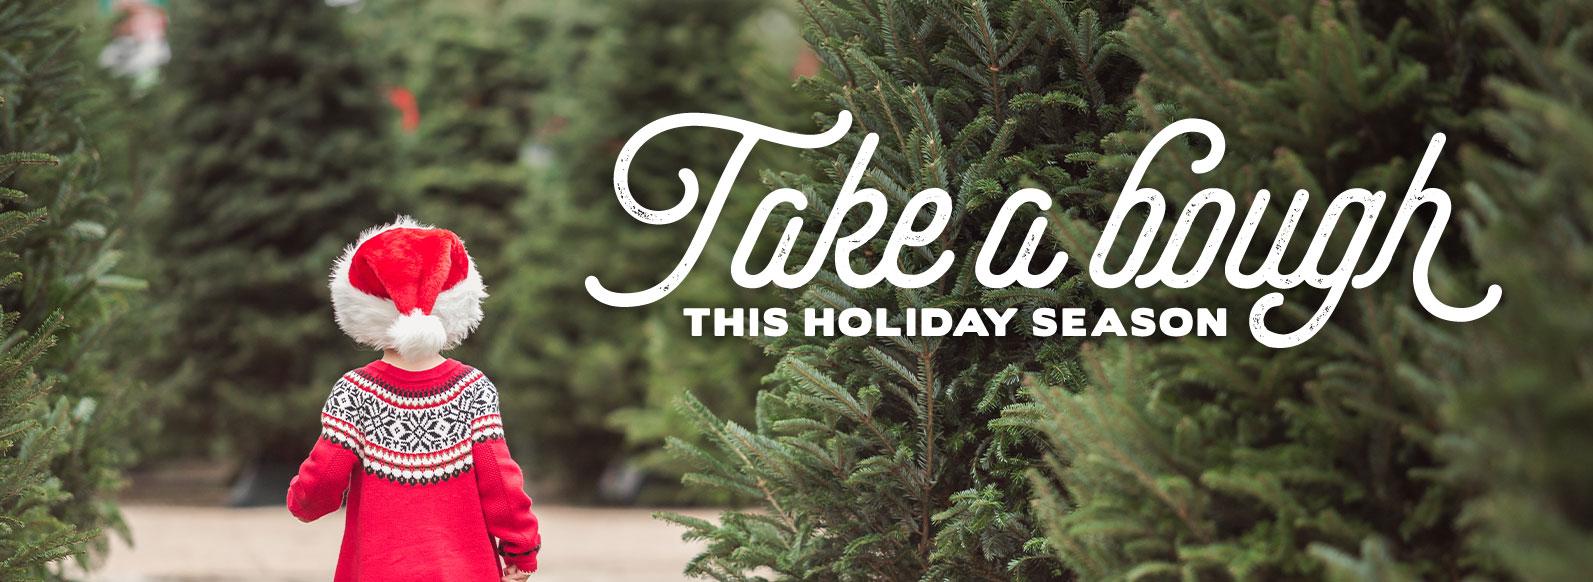 Take a bough this holiday season.